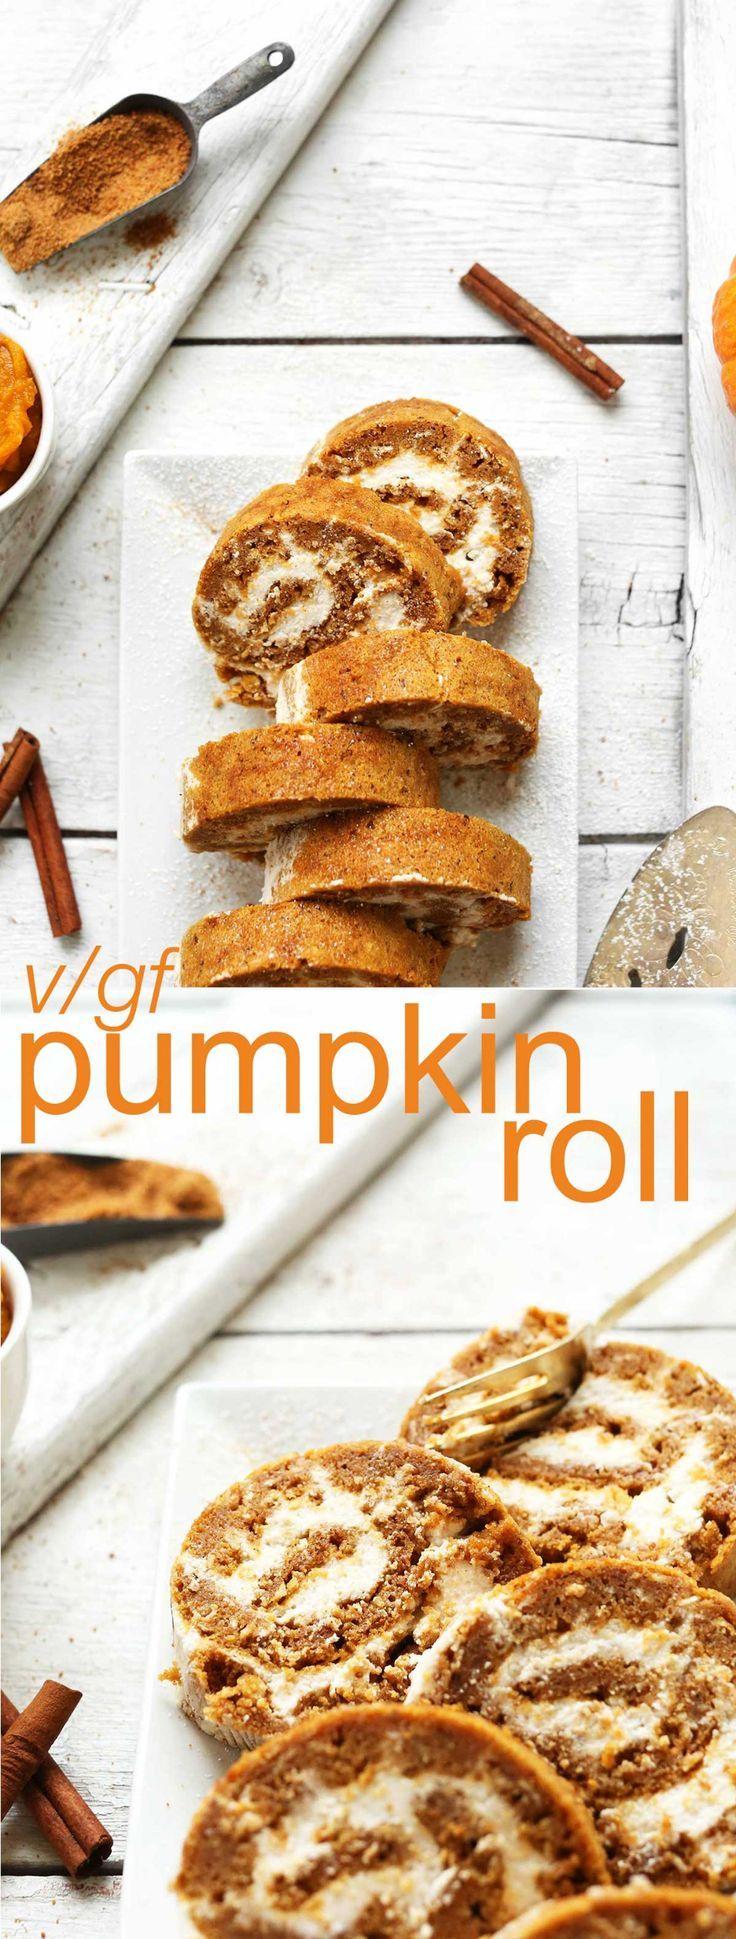 Photo of Vegan Gluten Free Pumpkin Roll | Minimalist Baker Recipes